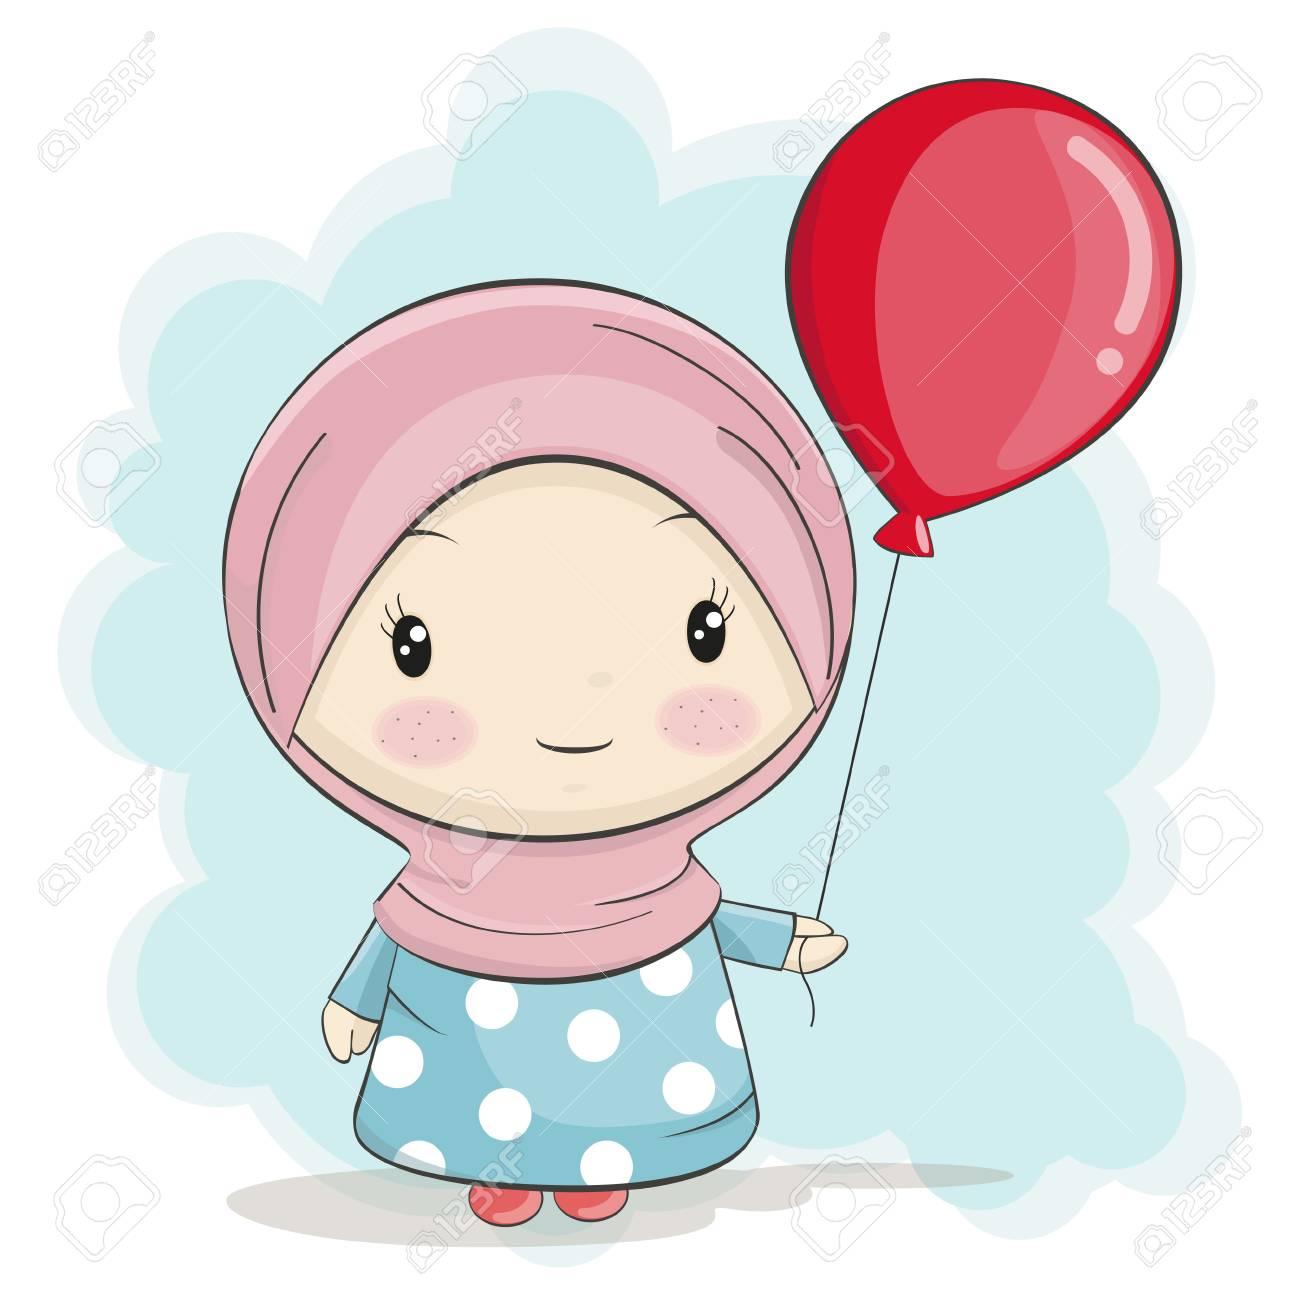 A cute muslim girl cartoon with red balloon vector illustration stock vector 70277239